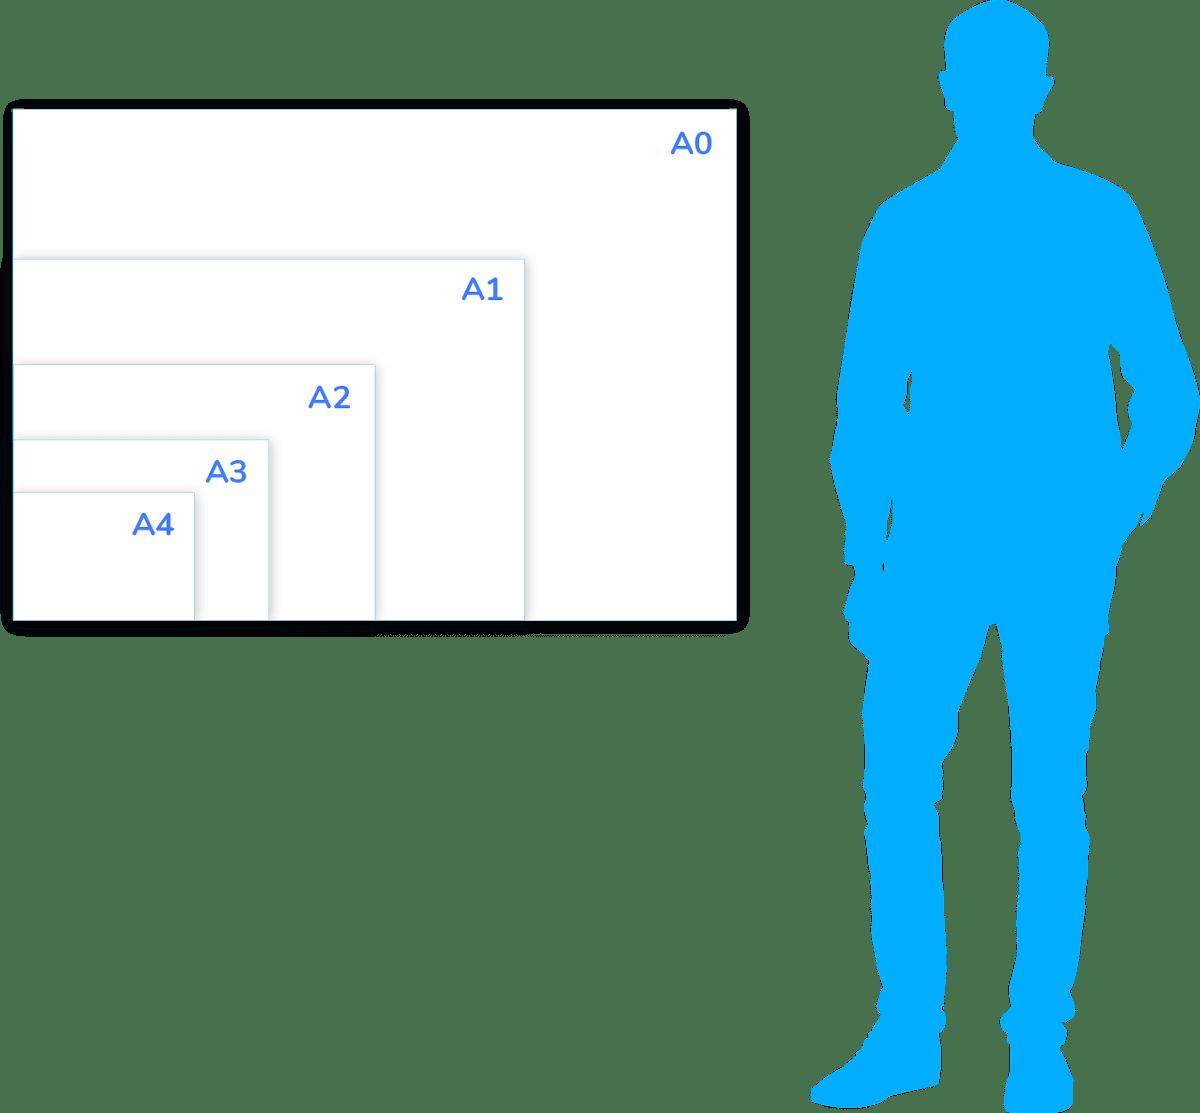 Custom Printed Whiteboard Sizes - A4, A3, A2, A1, A0